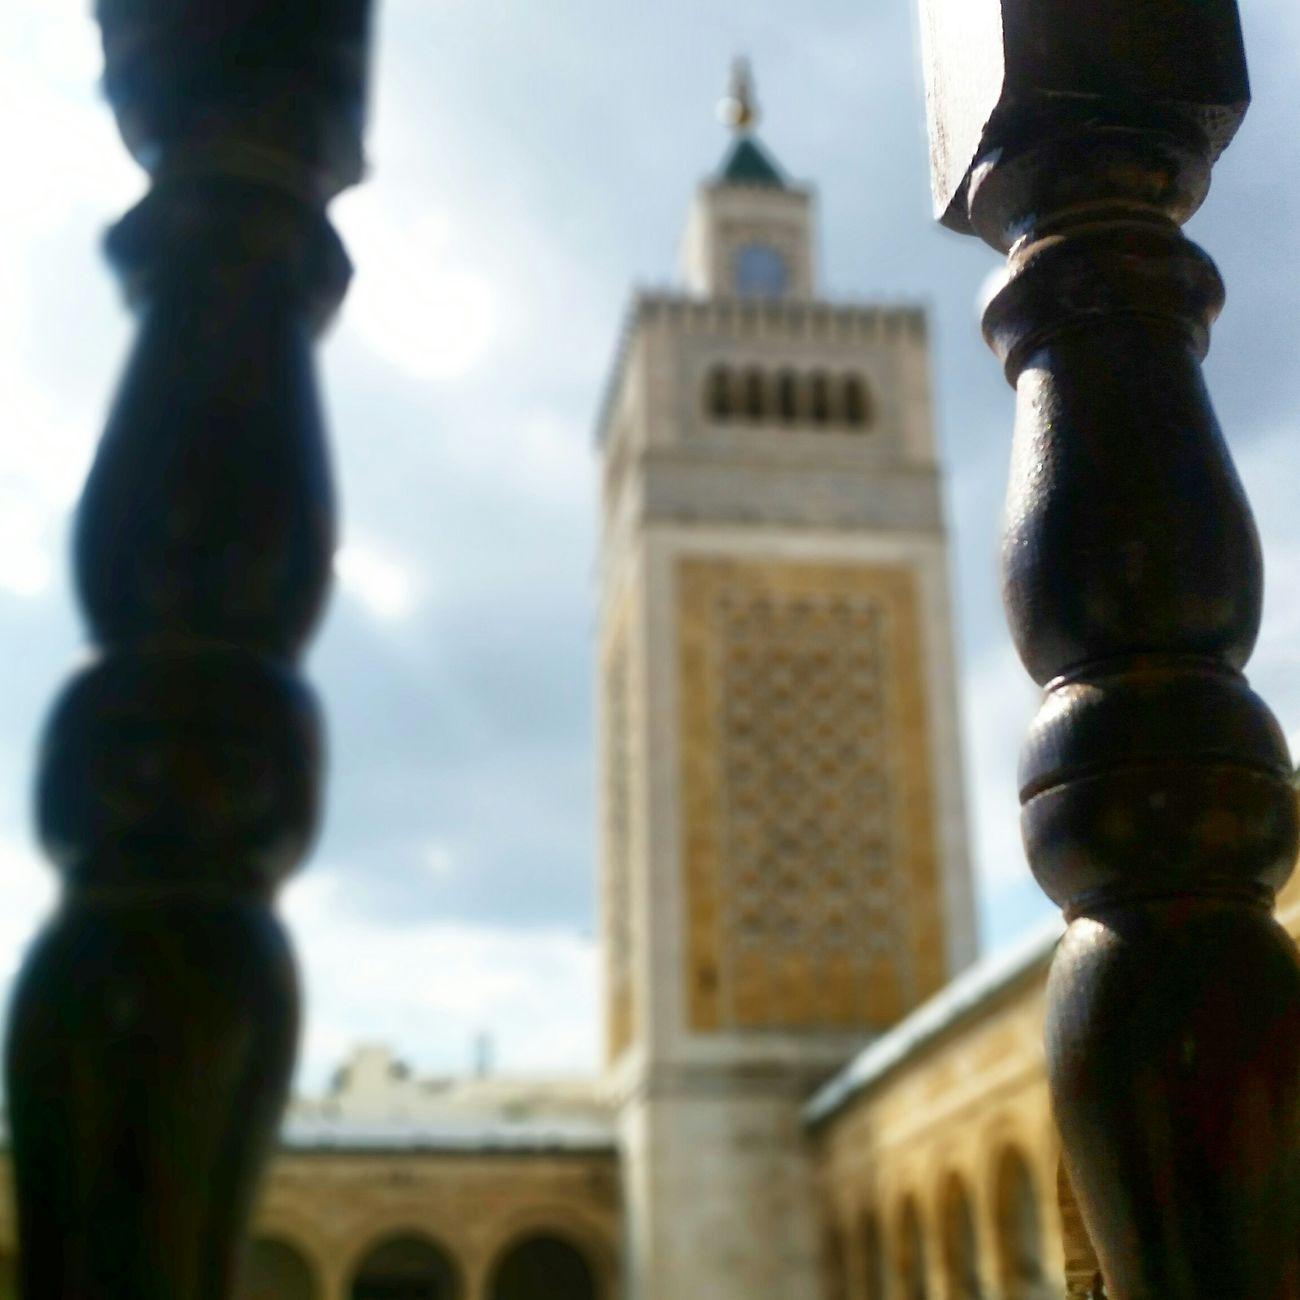 mosquée zitouna Architecture Arabo Musulmane Tunisia Beautiful Place Smartphonephotography Eyeemtunisia Eyeemtunisie Spring2015